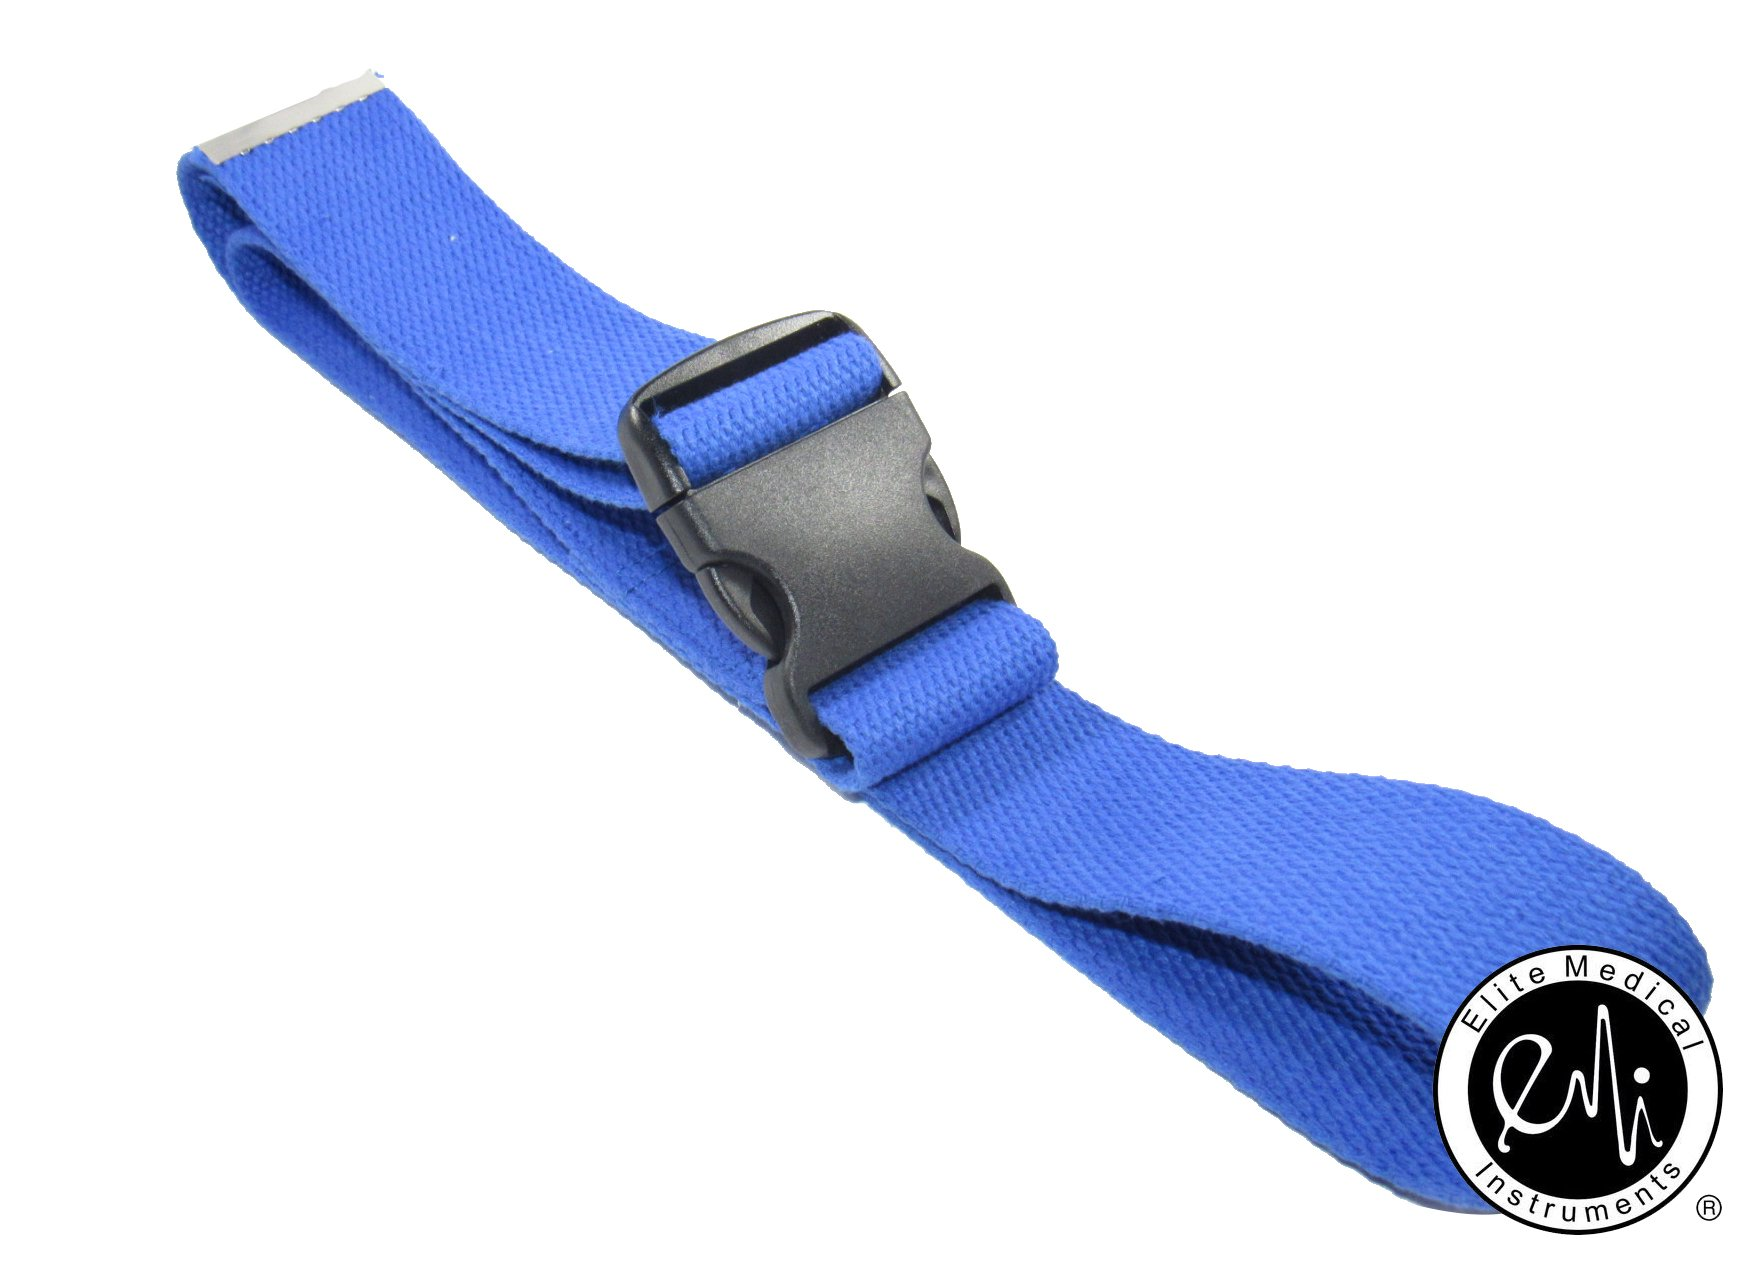 EMI 60'' Gait Transfer Belt ROYAL with Plastic Buckle 100% Cotton 624-P-Roy